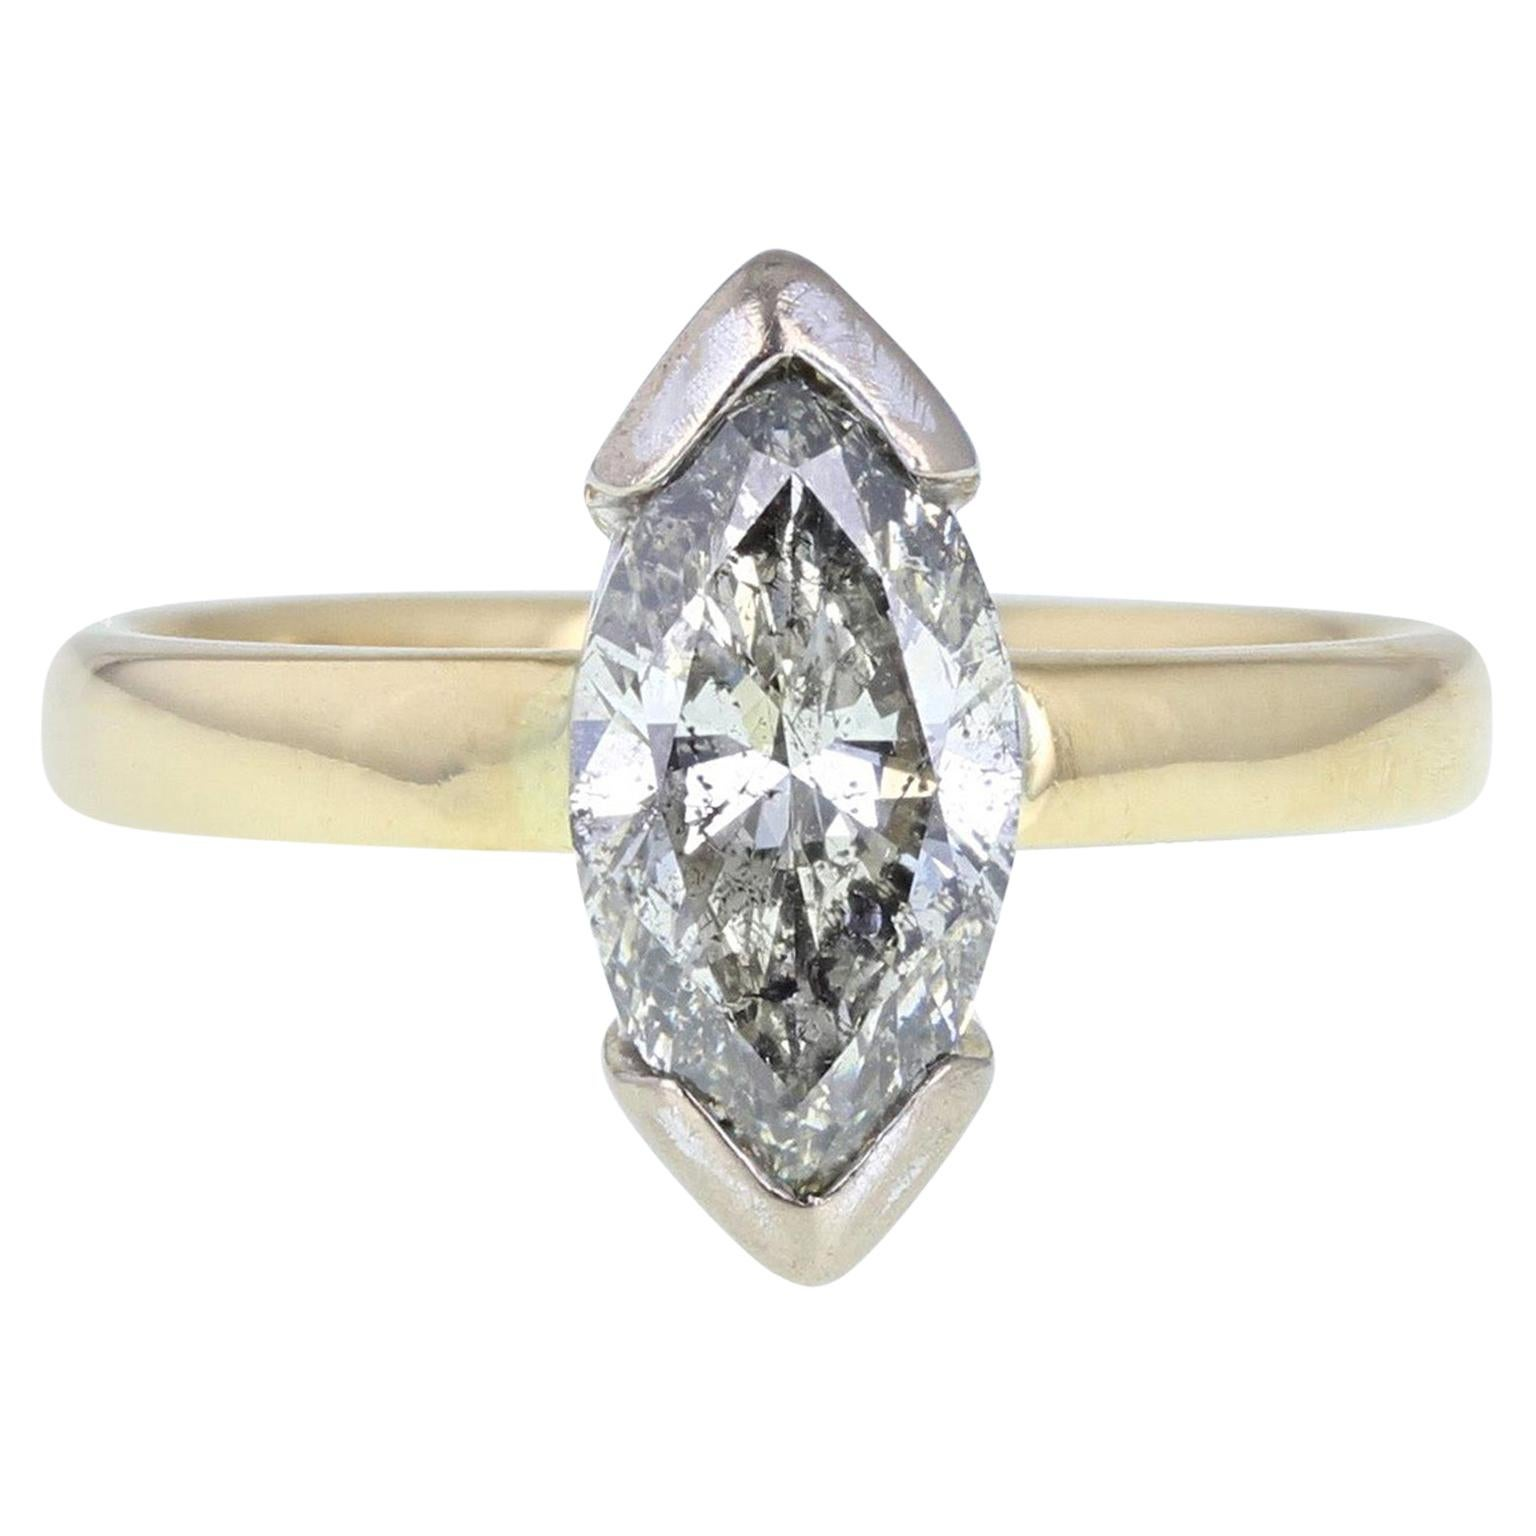 18 Carat Gold 2 Carat Marquise Cut Diamond Solitaire Engagement Ring